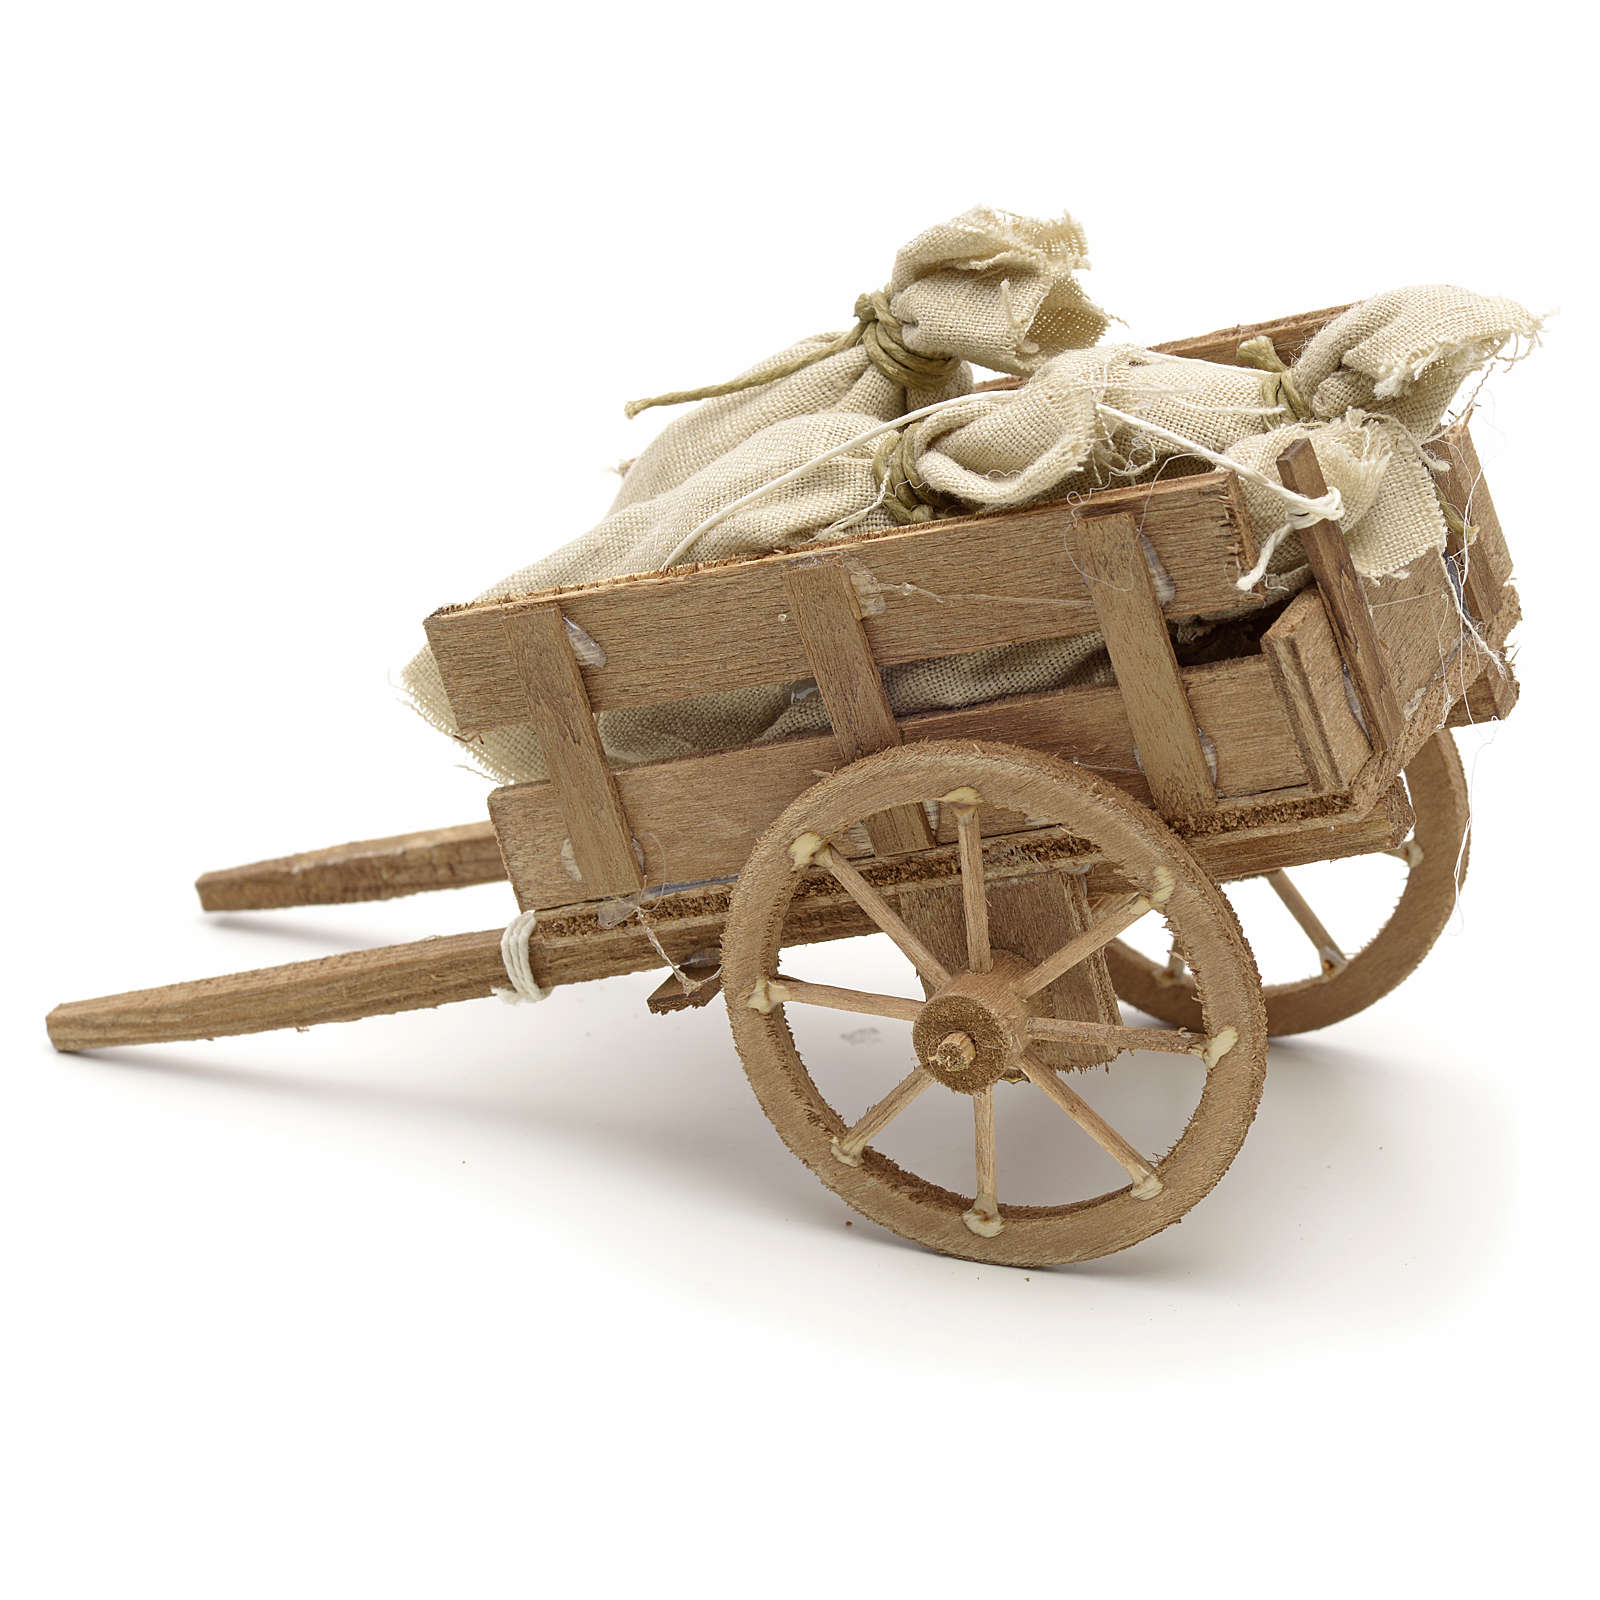 Neapolitan Nativity scene accessory, cart with sacks 4